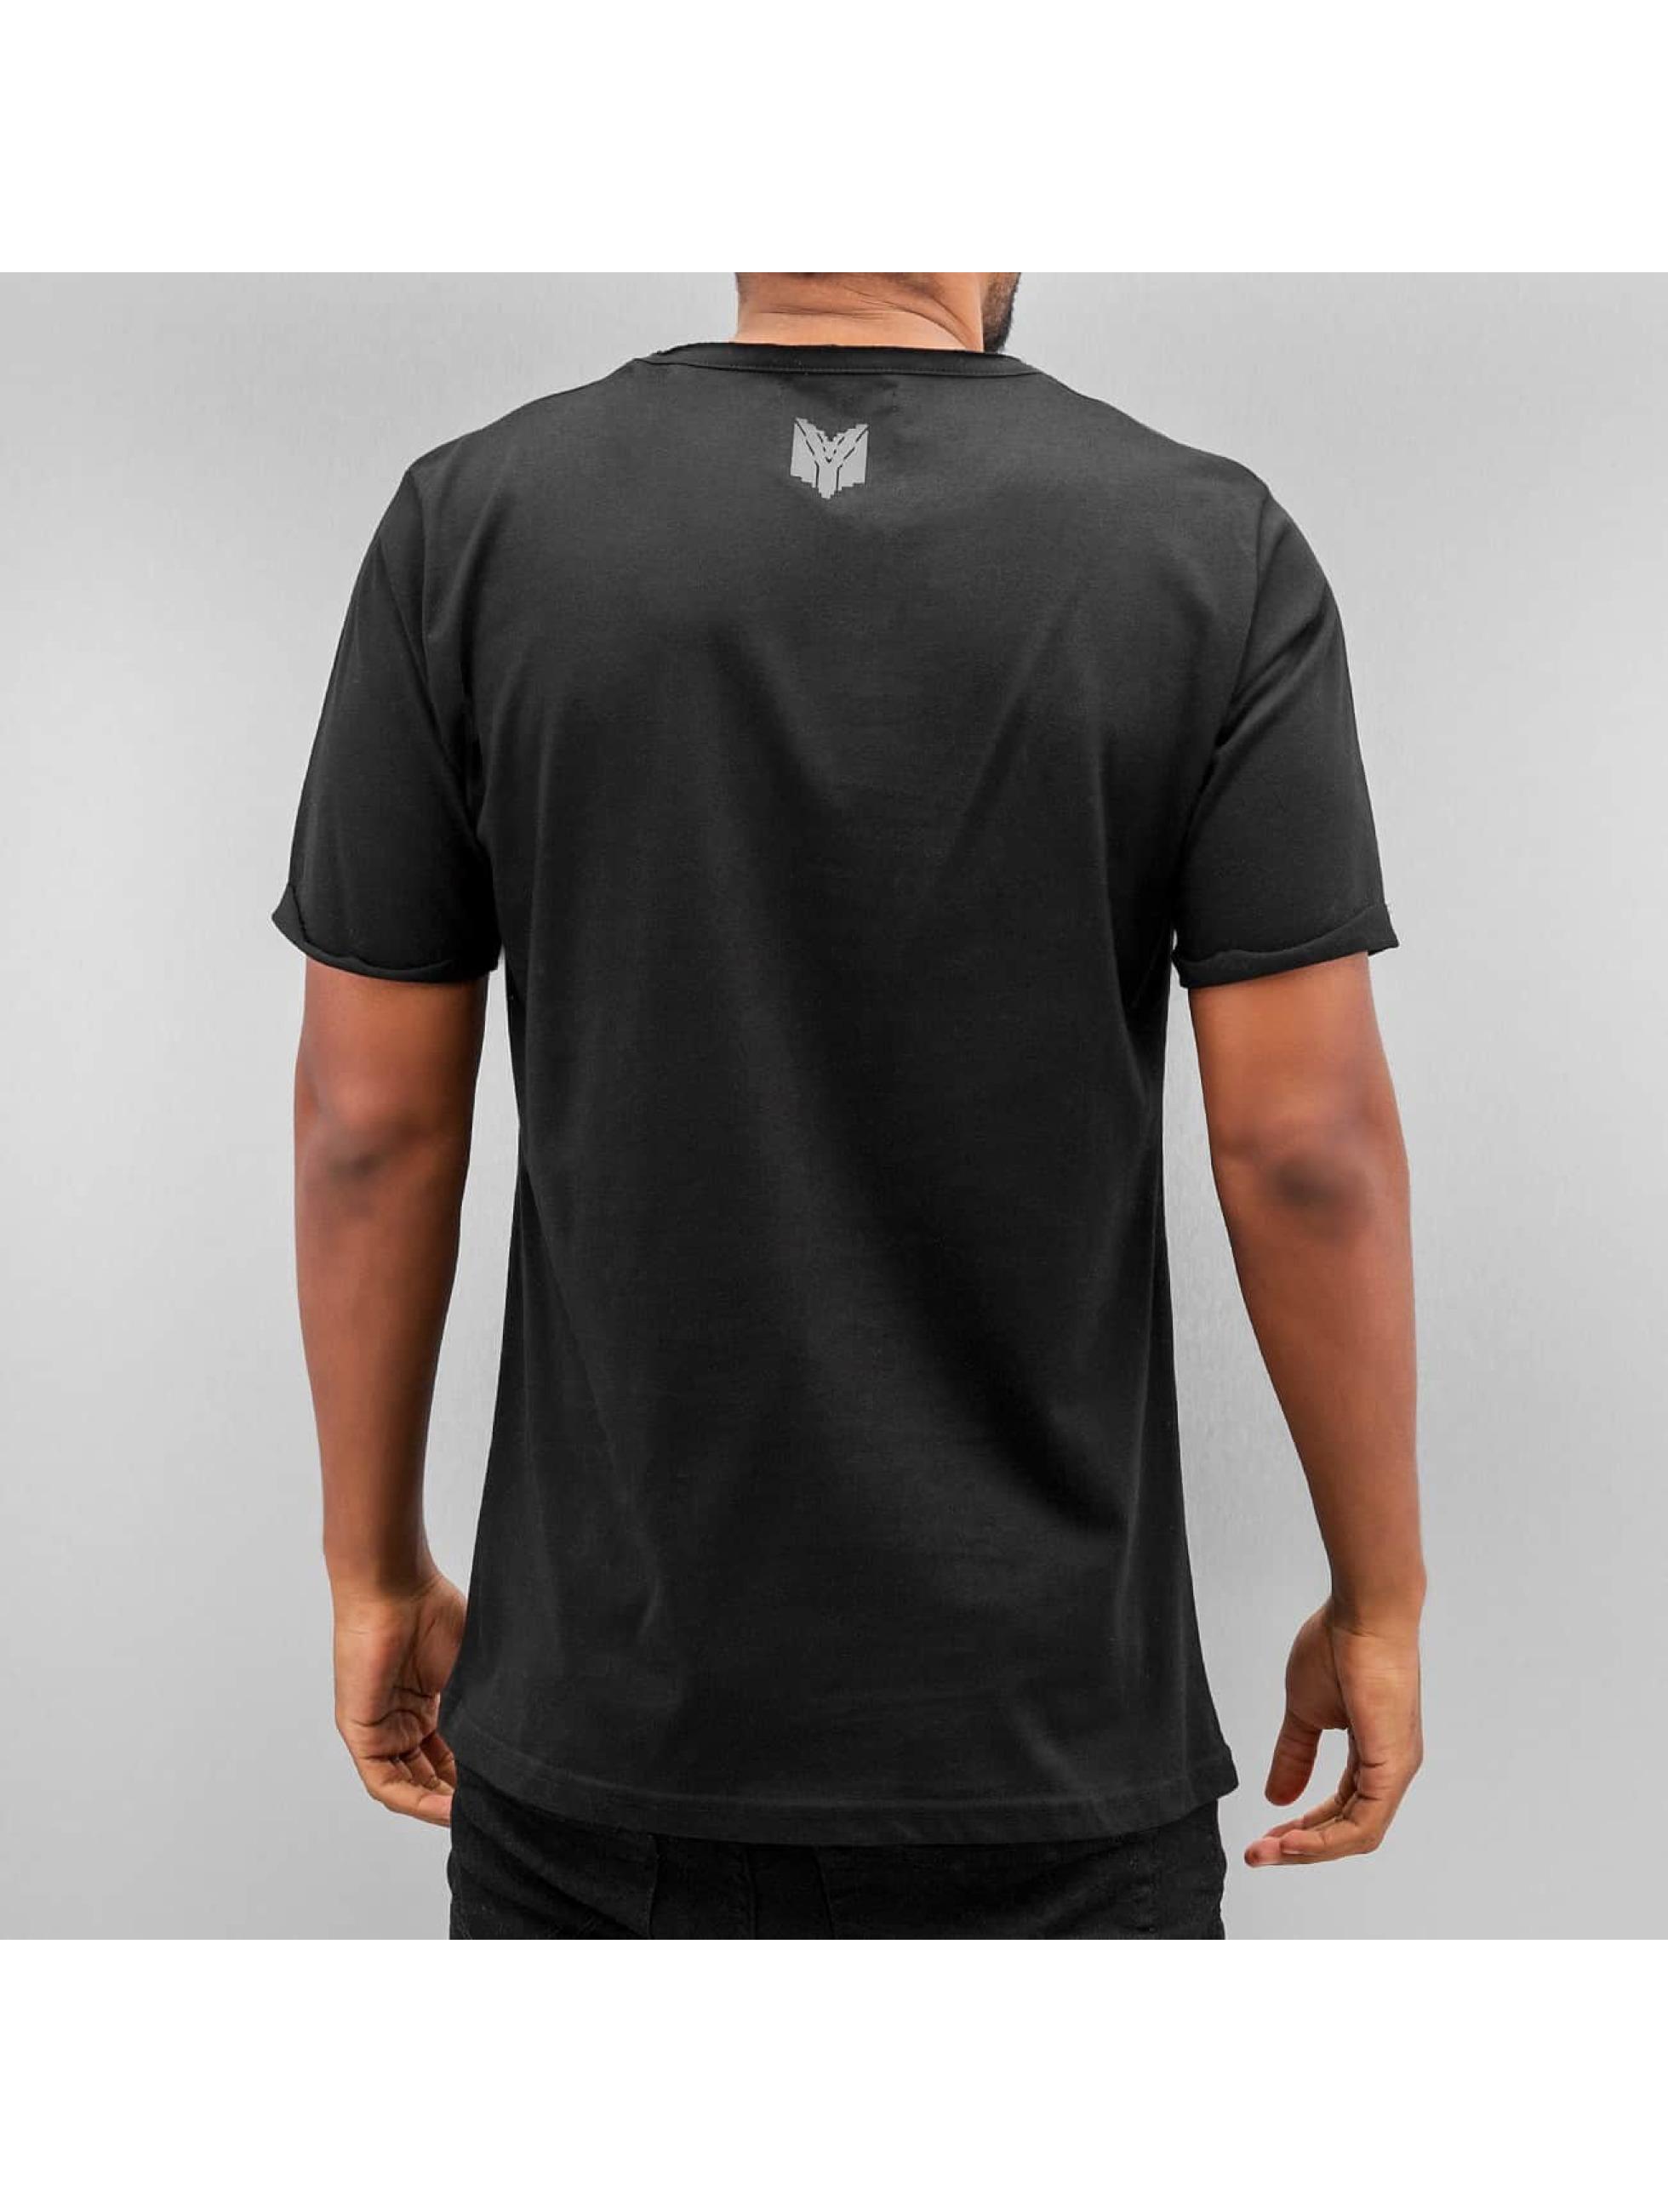 Yezz T-shirt Blank svart